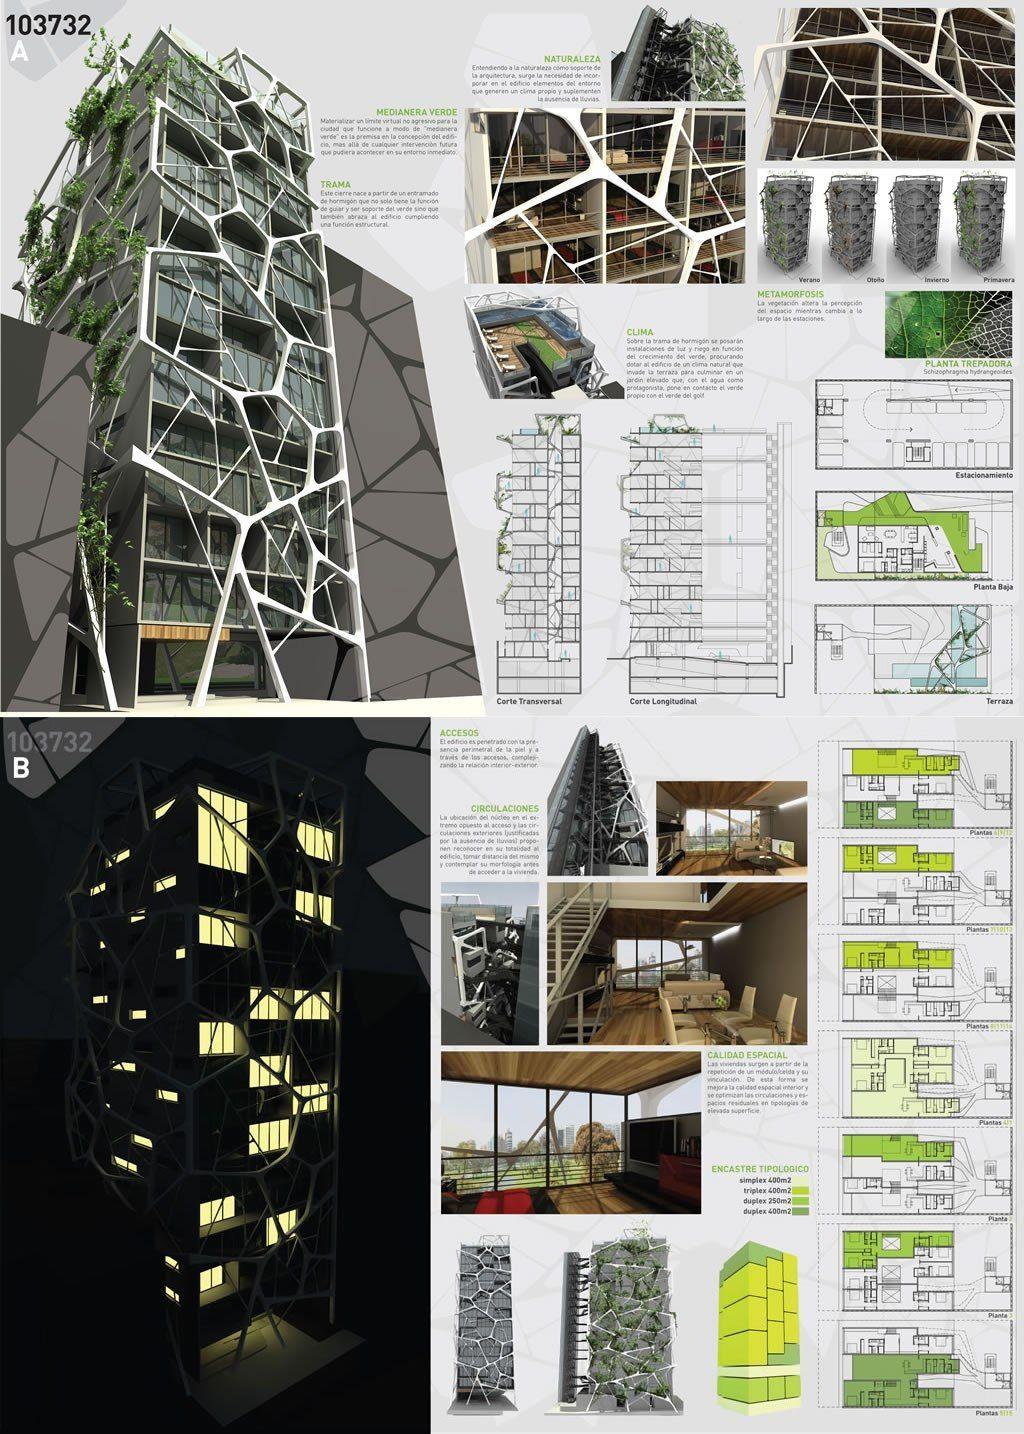 Paneles De Presentacion De Arquitectura Architektonischeprasentation Visita La Entrada Para Saber Mas In 2020 Konzept Architektur Architektur Architektur Prasentation